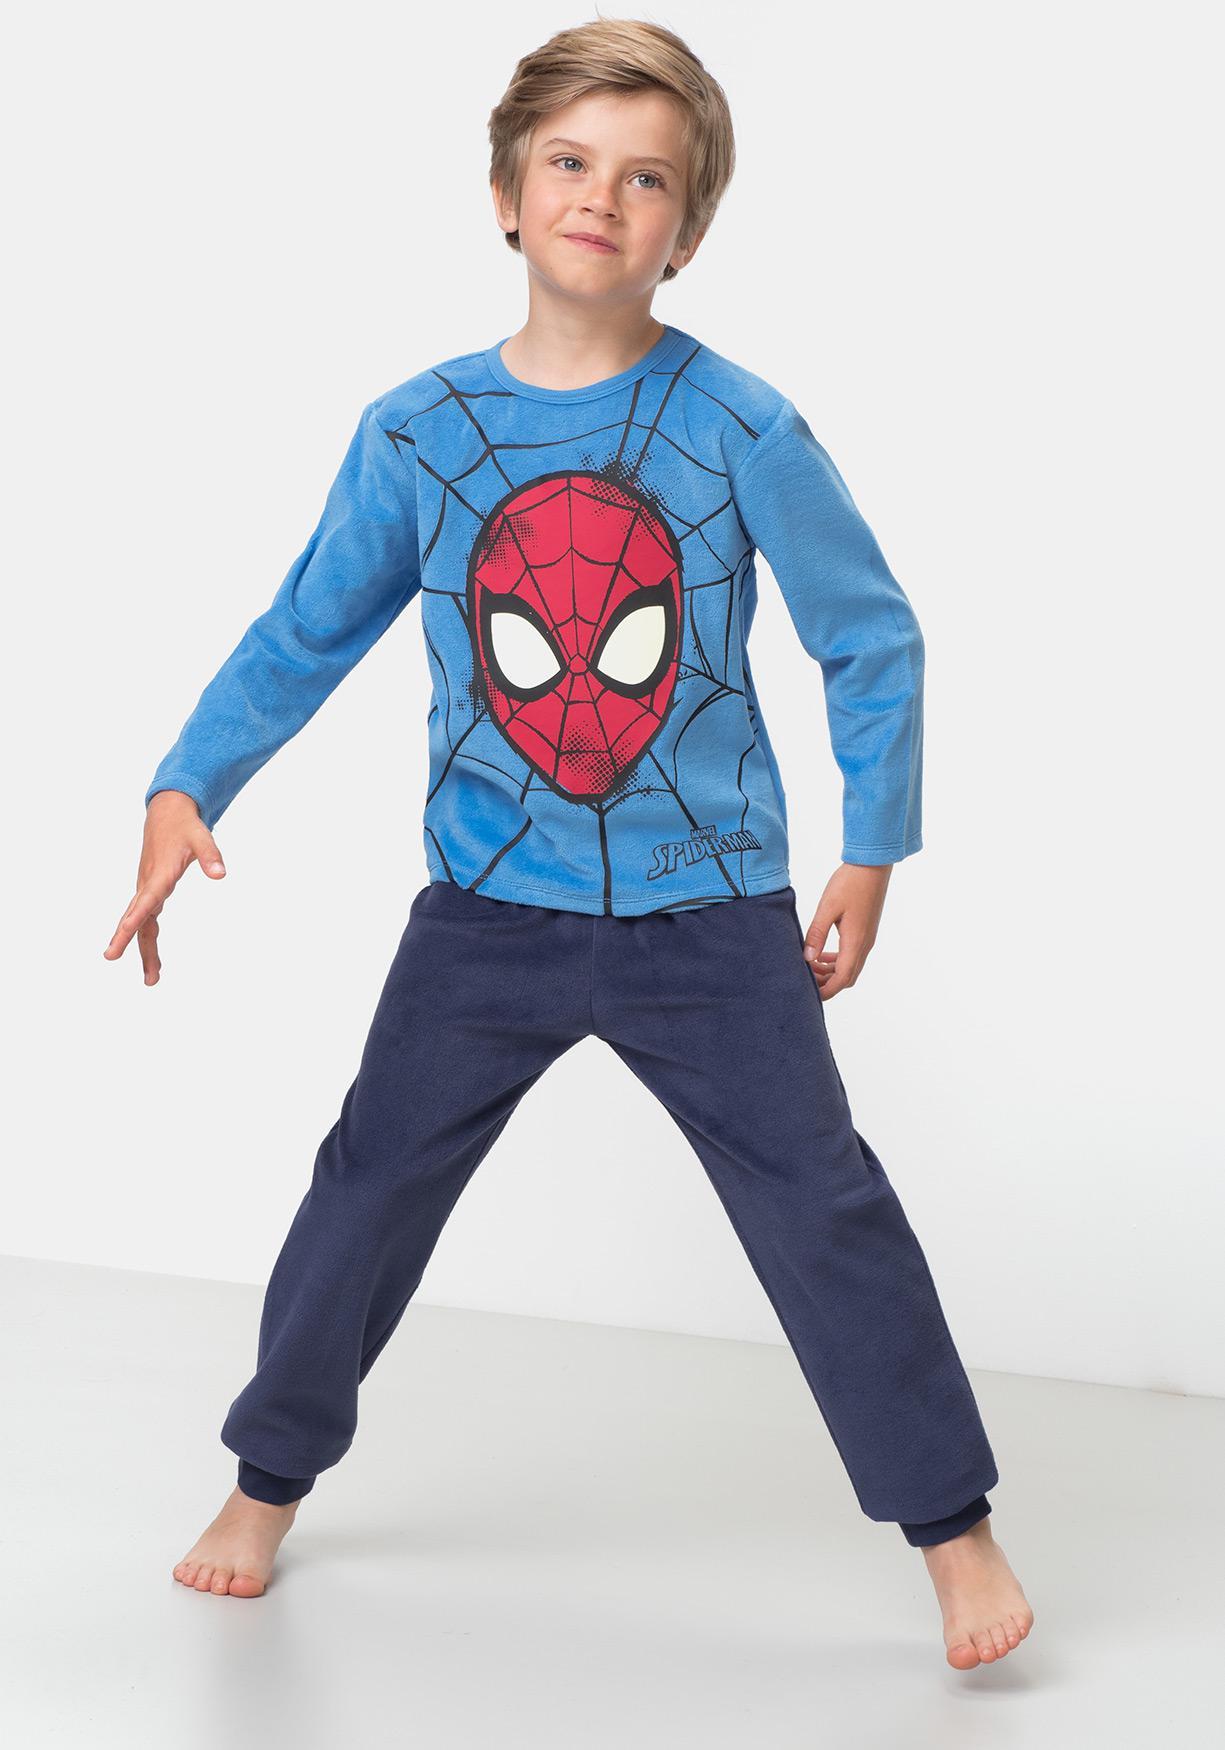 Comprar Pijama manga larga Spiderman de MARVEL. ¡Aprovéchate de ... 7059d260282bb